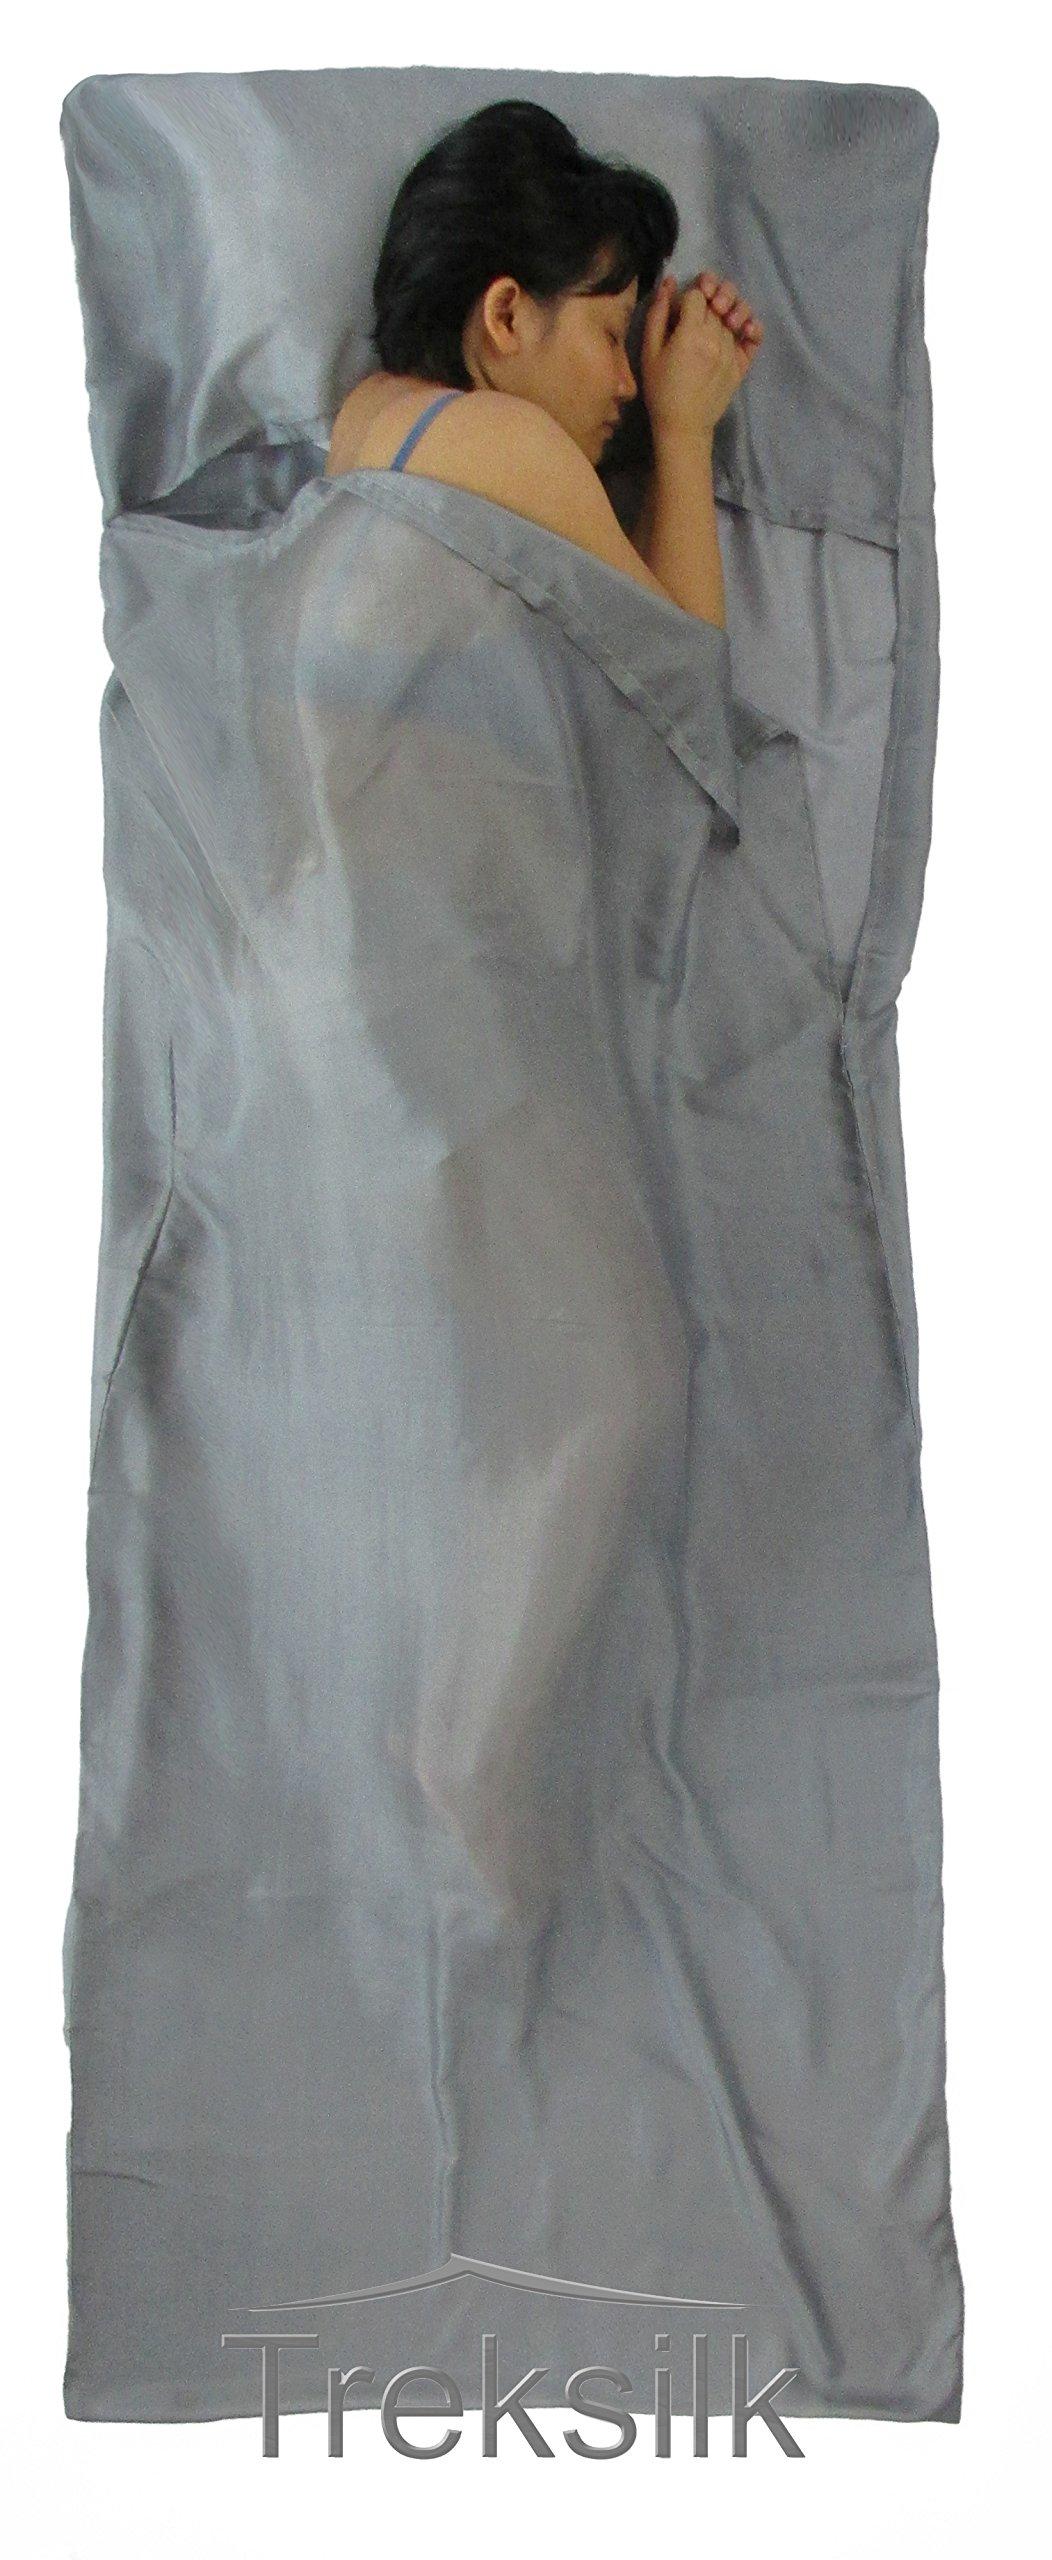 Treksilk: 240 cm! 100% Mulberry Silk Single Sleeping Bag Liner Travel Sheet Sack (Gray) by Treksilk